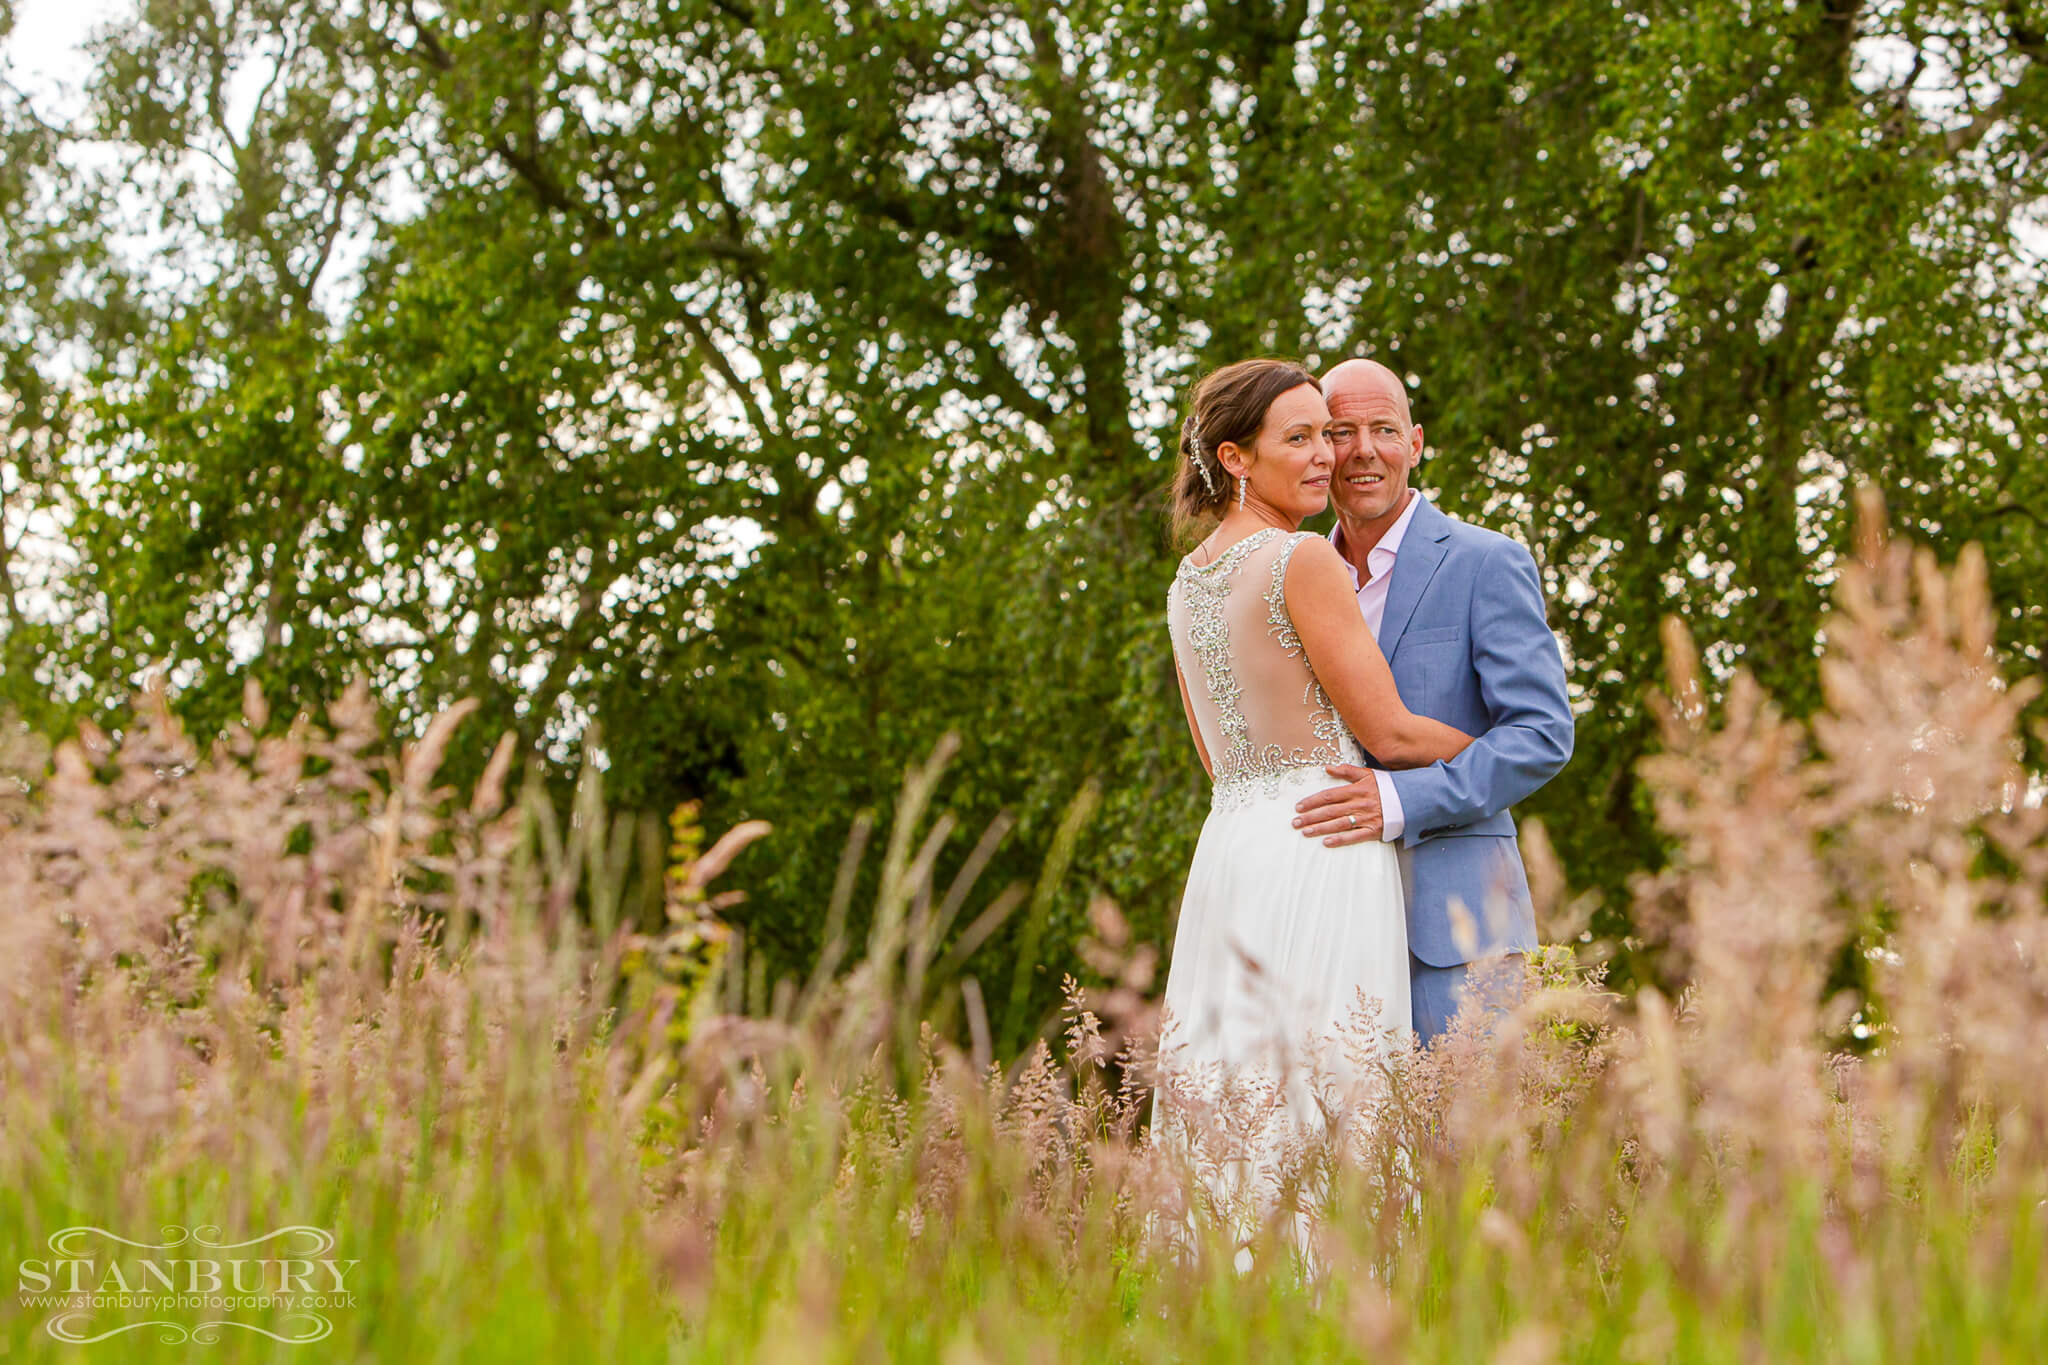 tipi-festival-bride-groom-wedding-photography-lancashire-stanbury